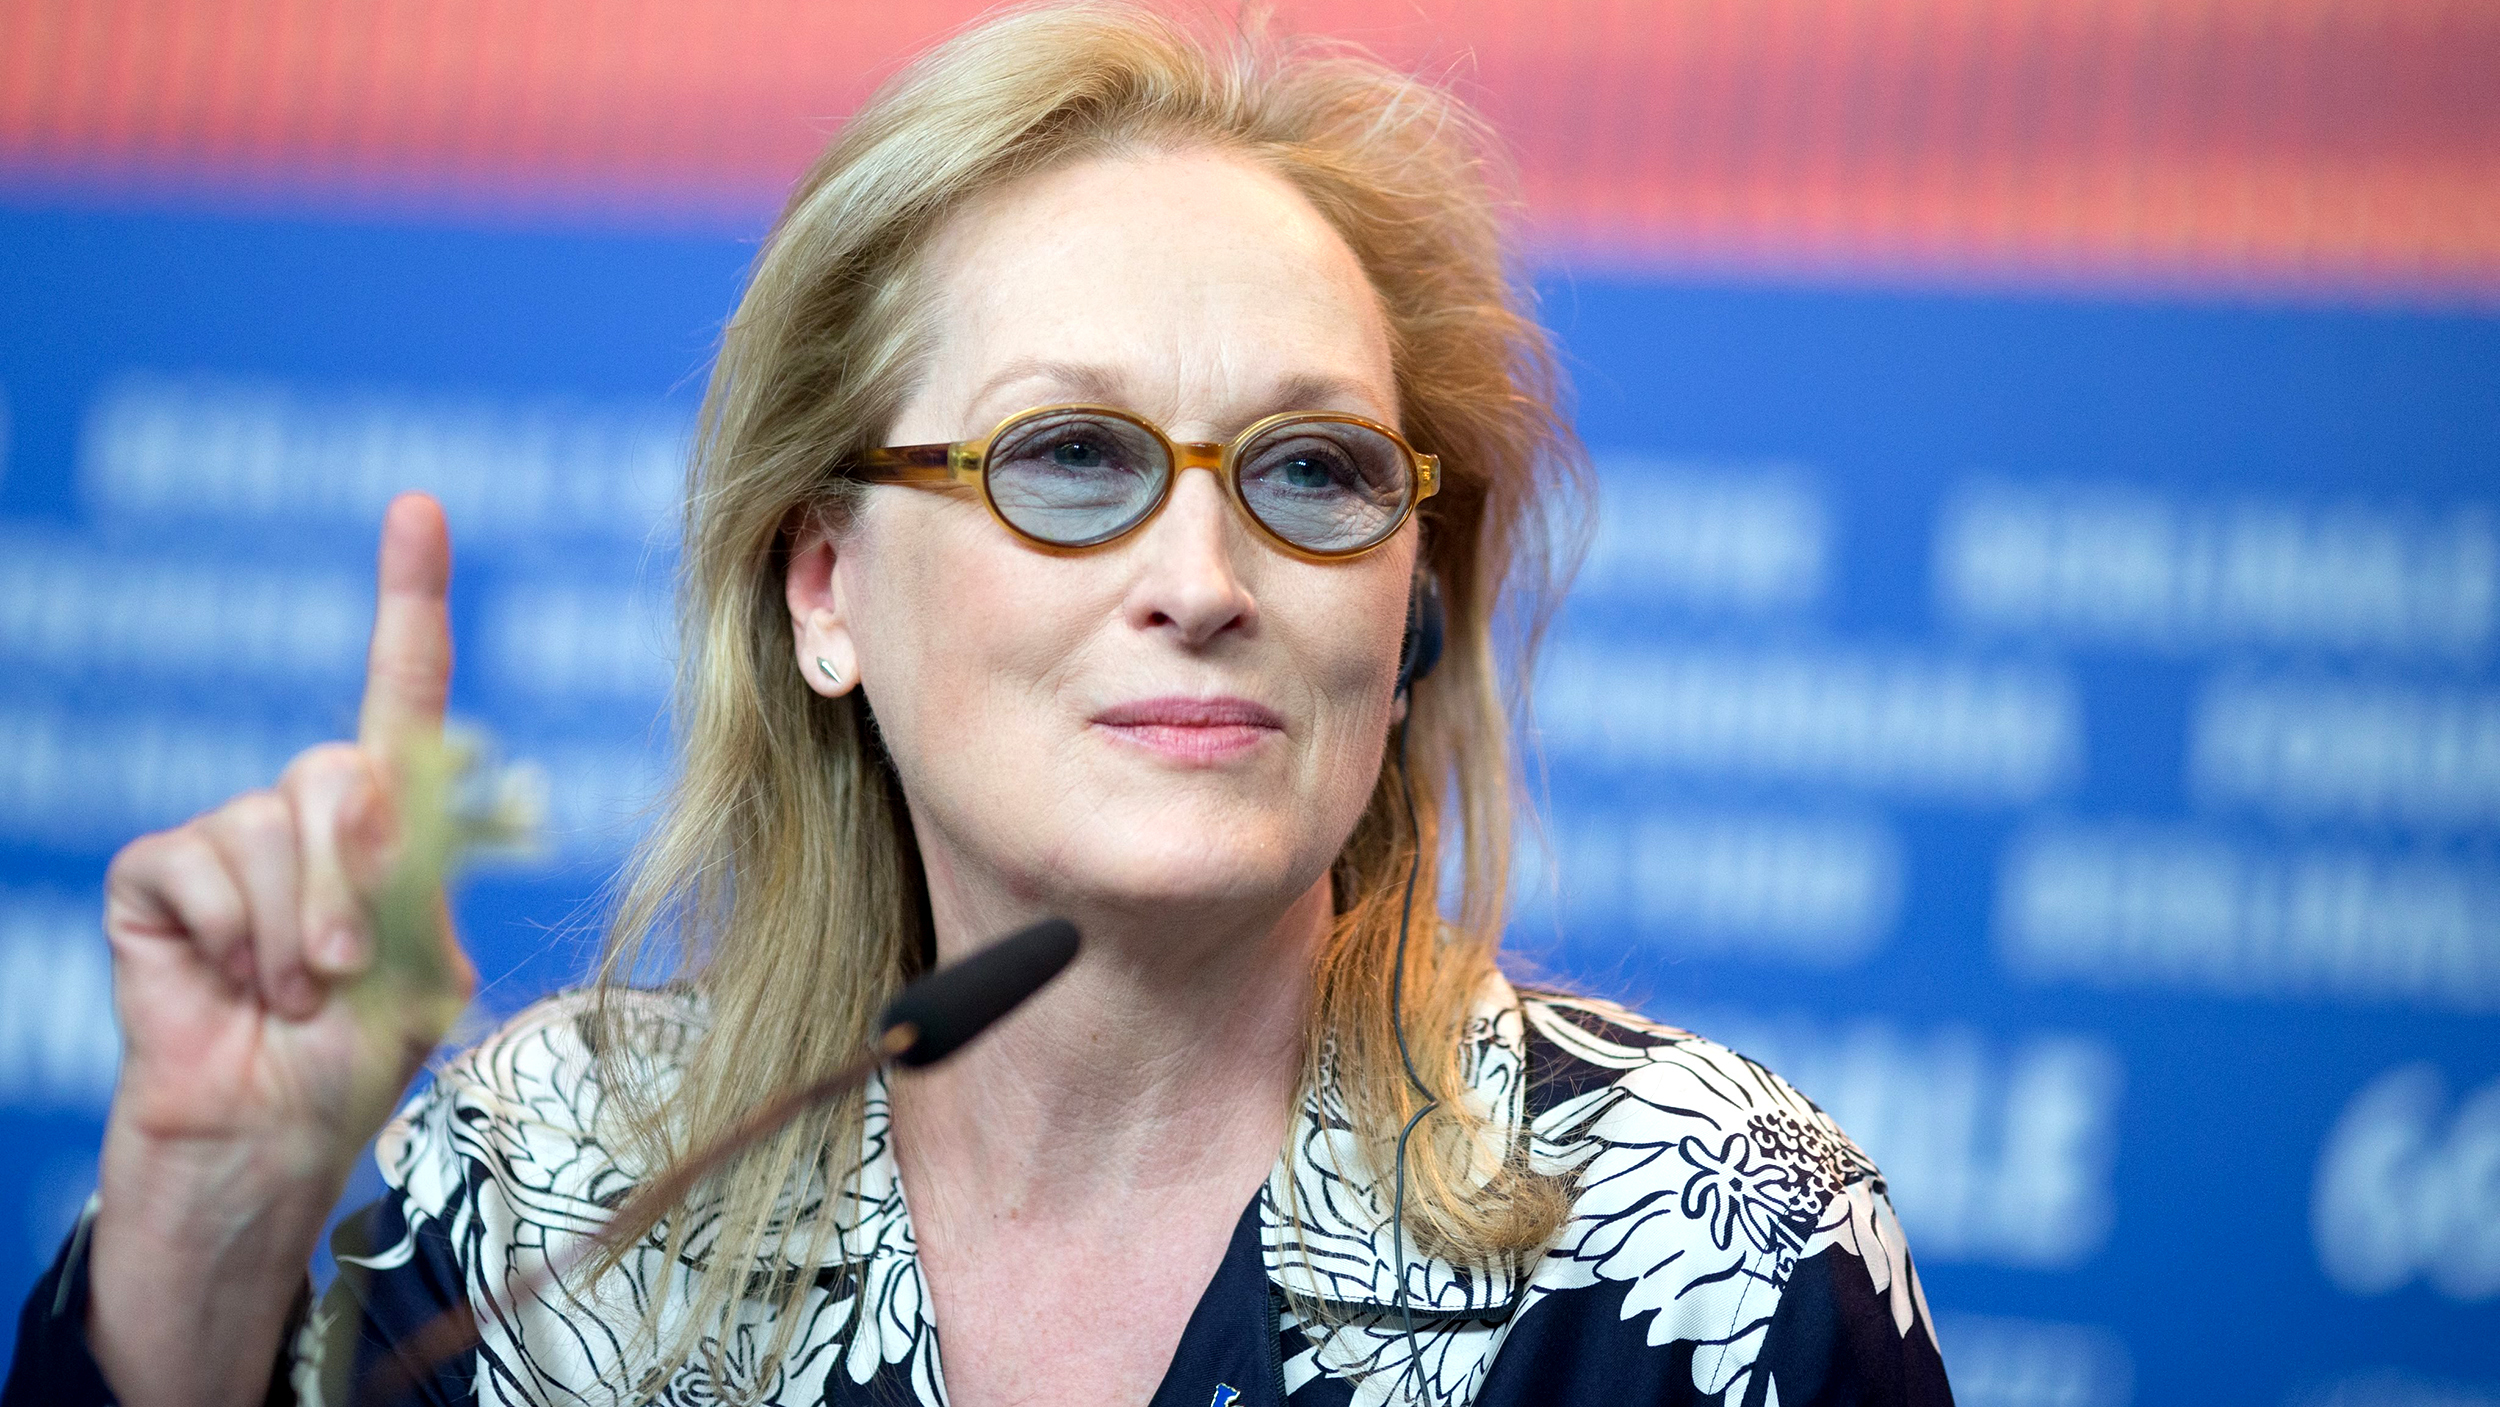 Meryl Streep Background